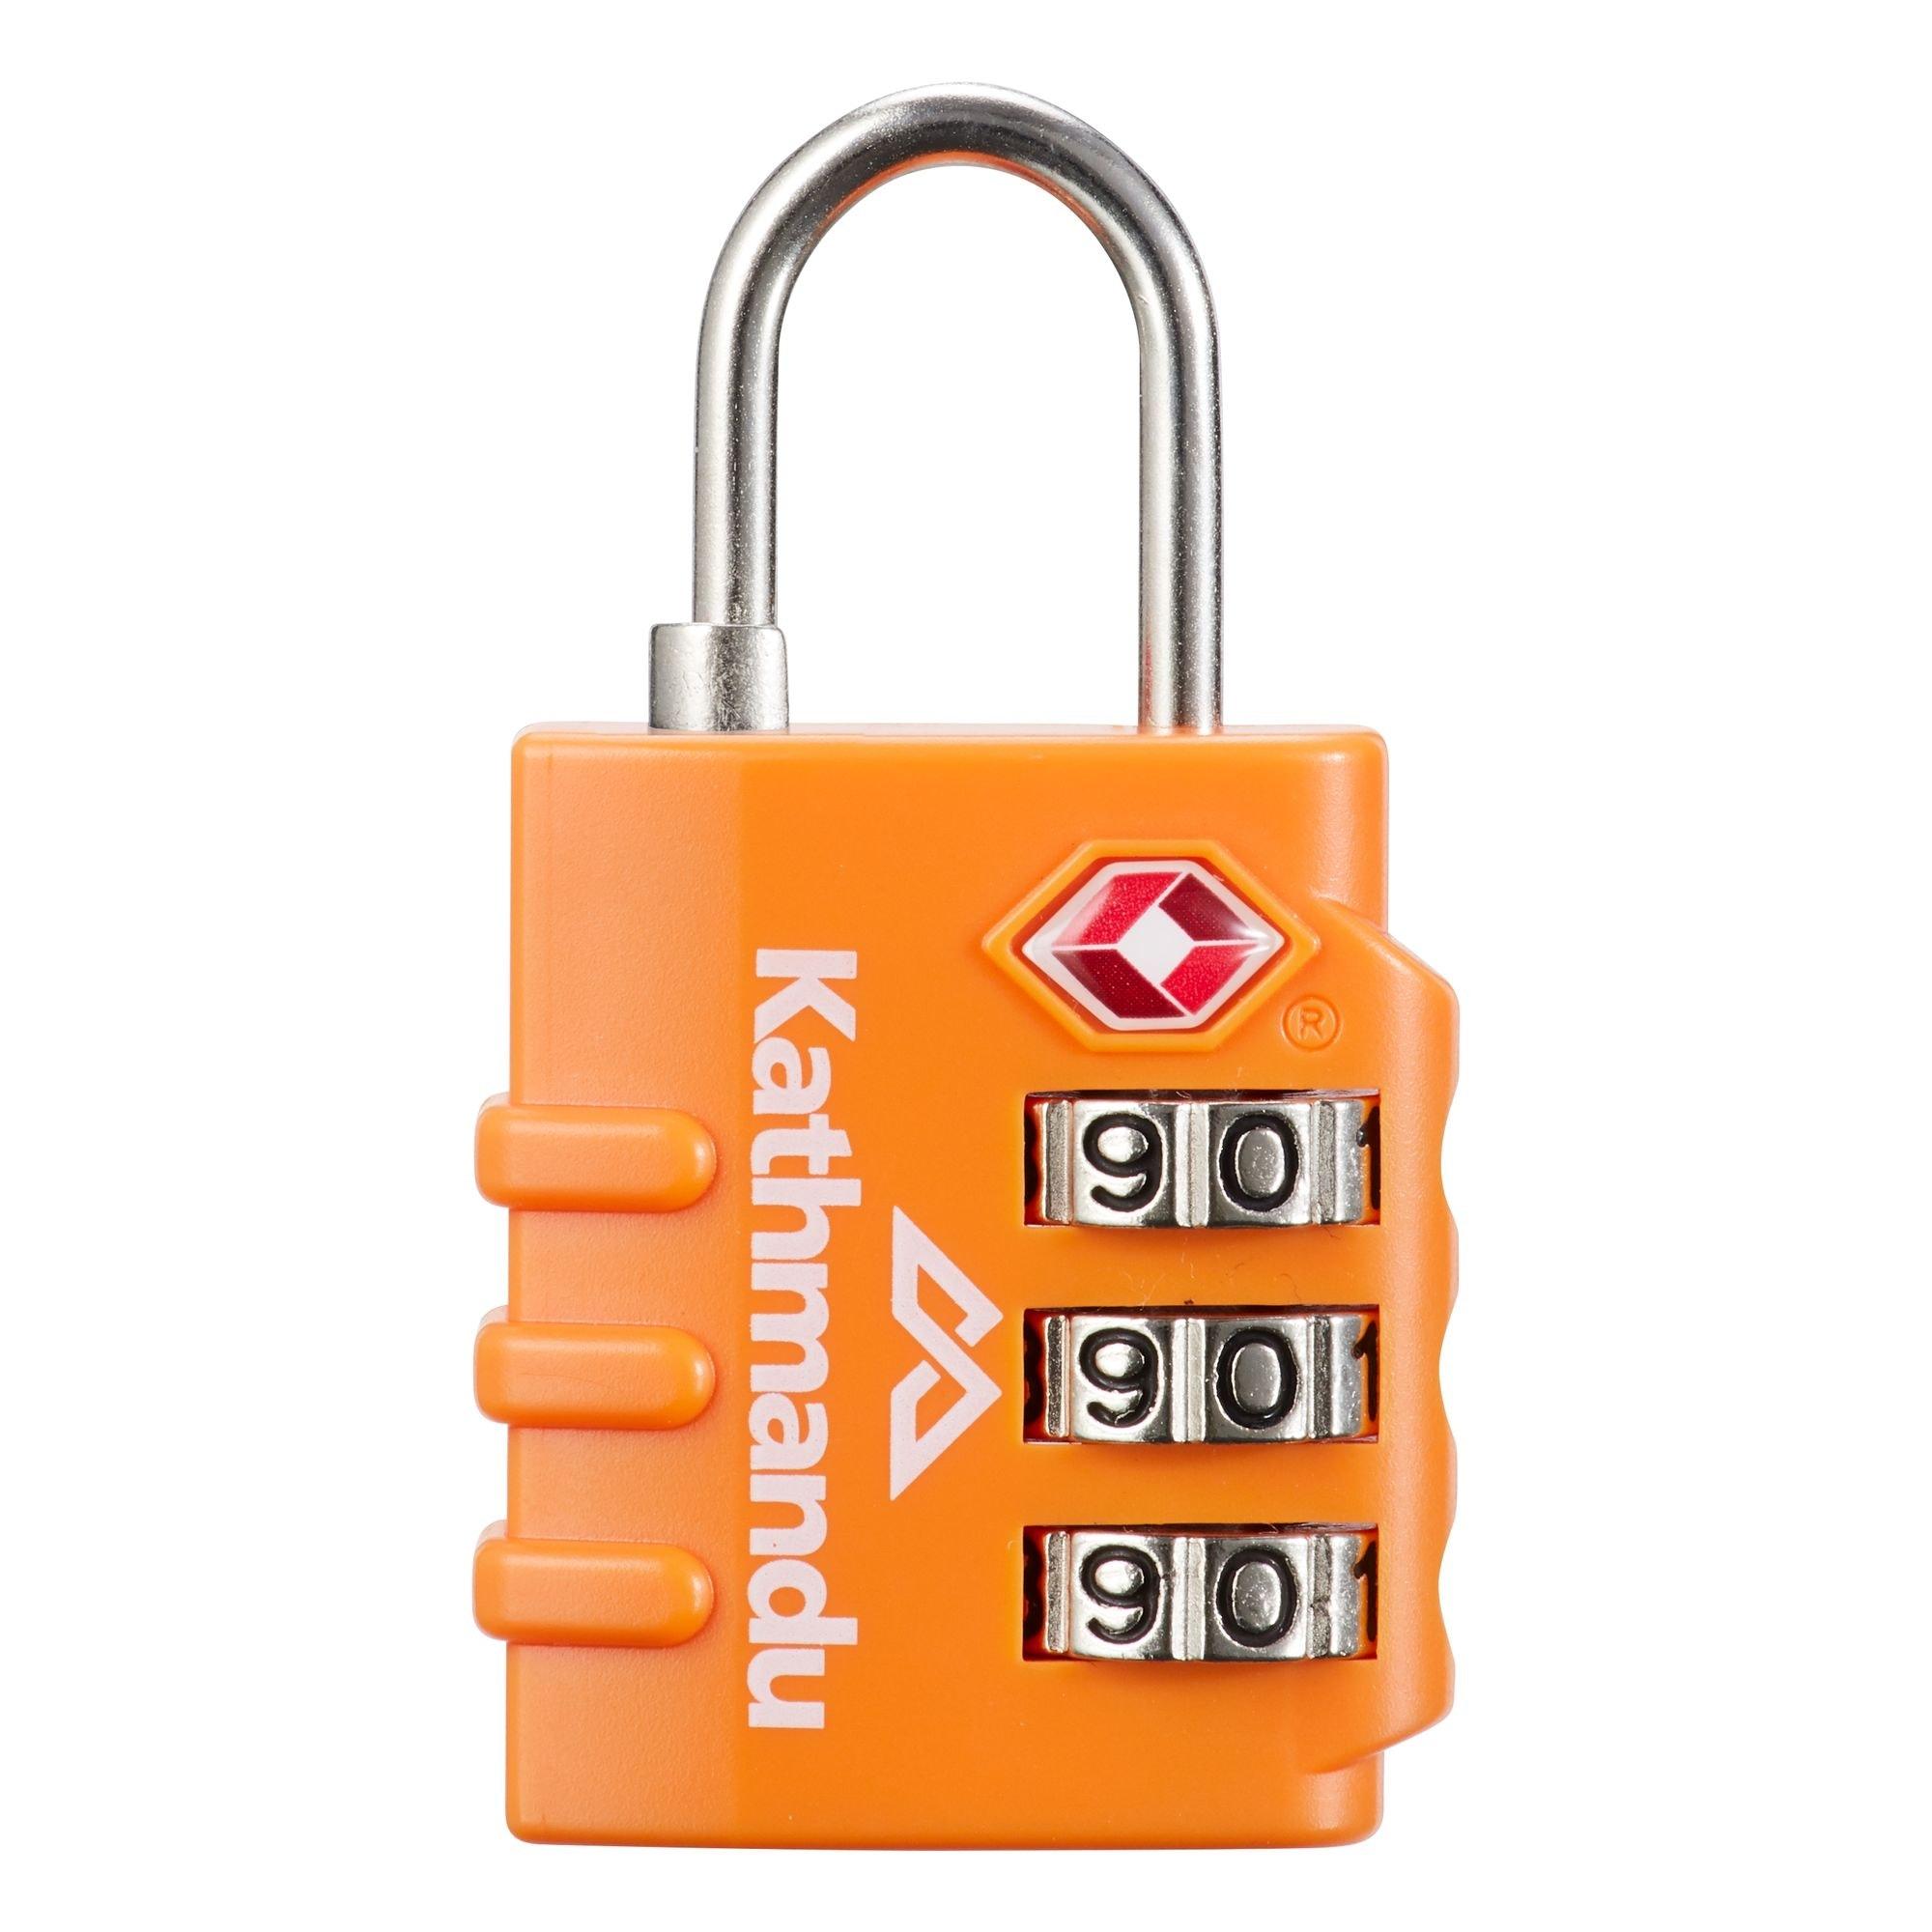 Security 3 Combination Travel Suitcase Luggage Bag Code Lock Zipper Padlock AW